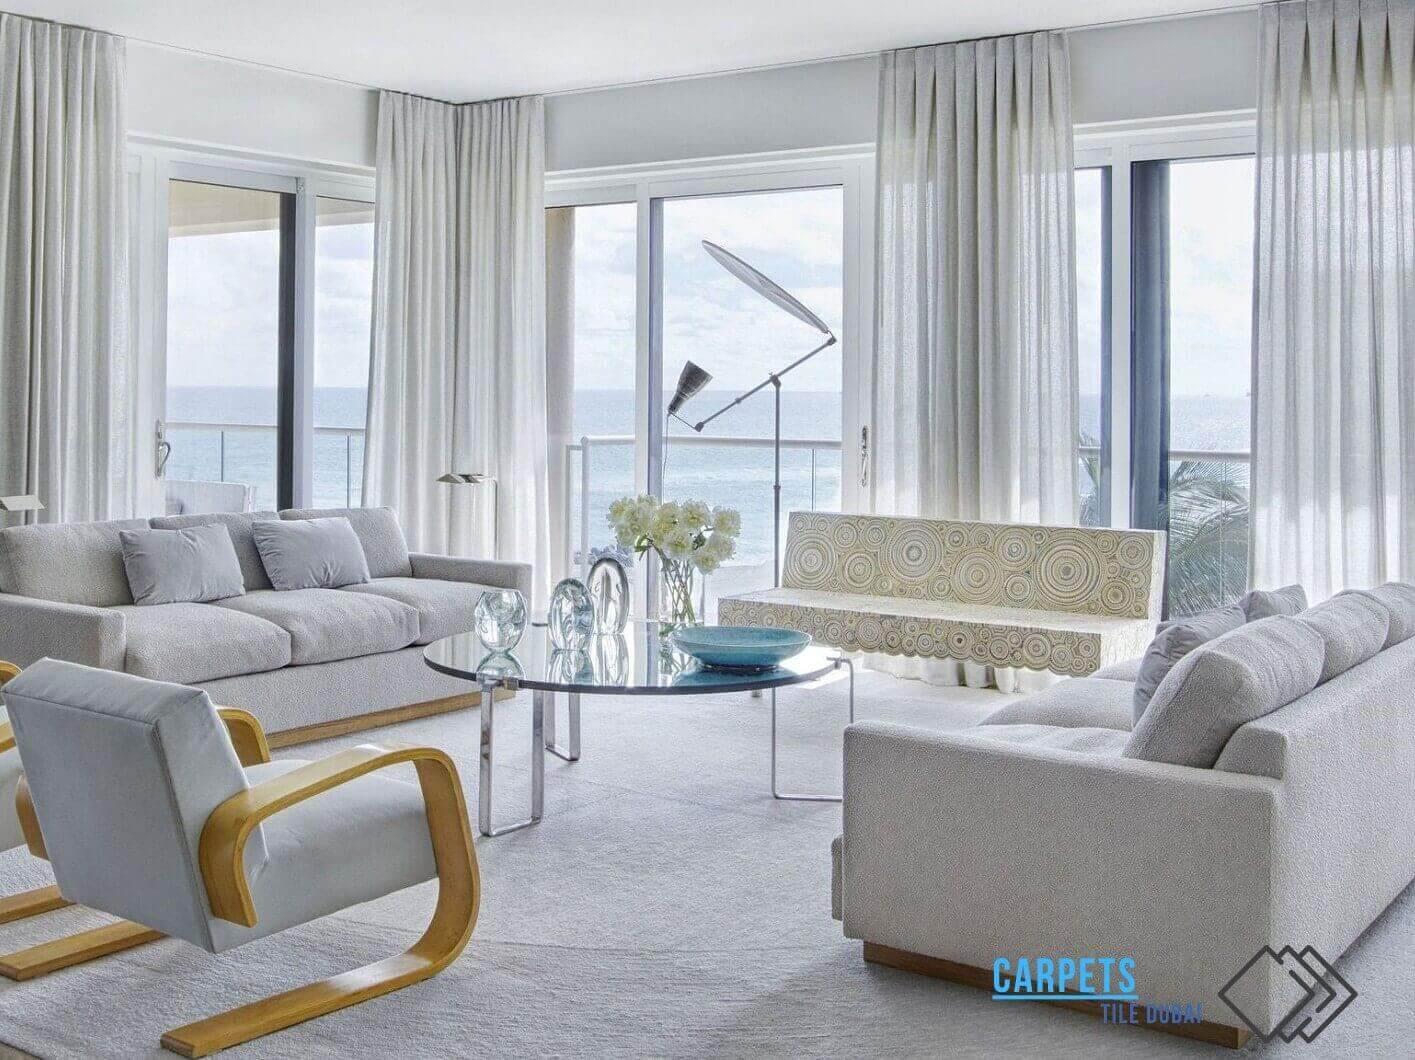 Home Carpets Dubai Price